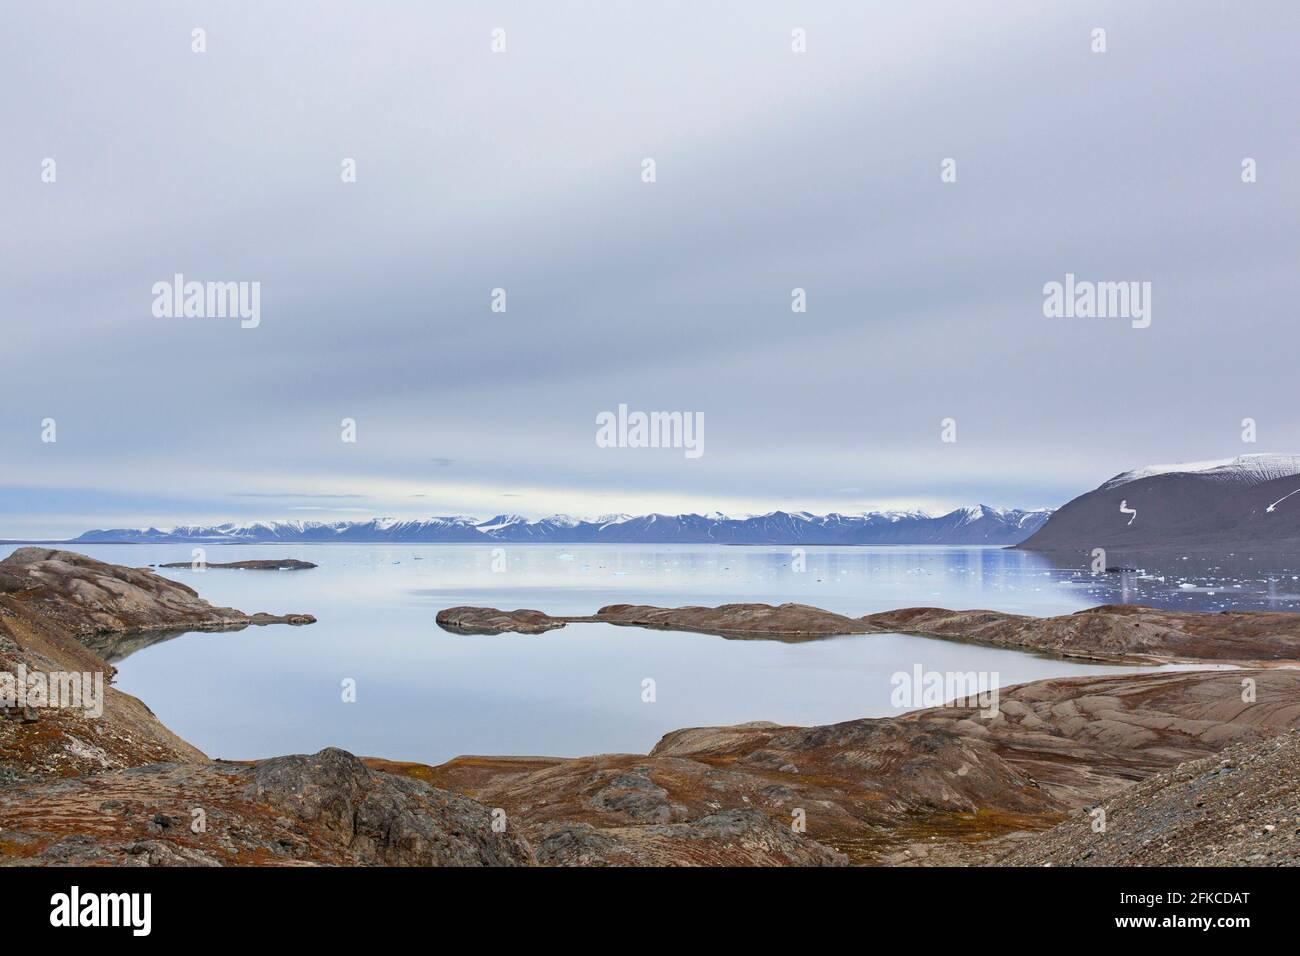 Vue sur Hornbaekpollen / Hornbækpollen, petite baie à Liefdefjorden, à l'est d'Erikbreen, Haakon VII Land en été, Spitsbergen, Svalbard, Norvège Banque D'Images